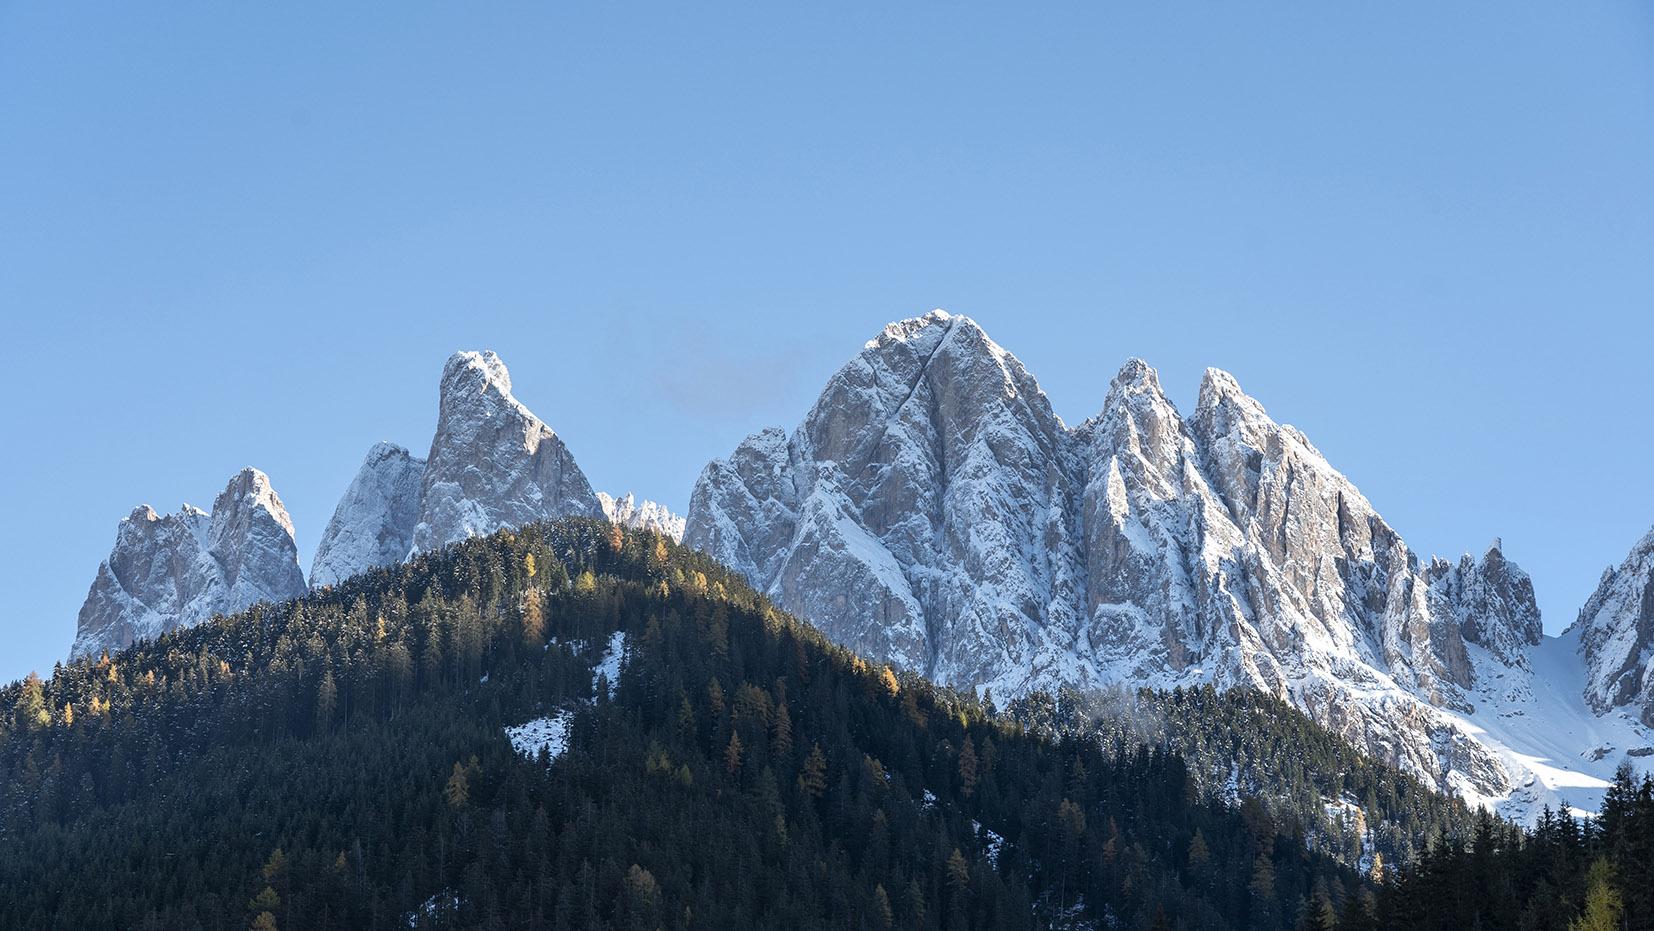 vue Sass Rigais Santa Magdalena cimes neige sapins ciel bleu